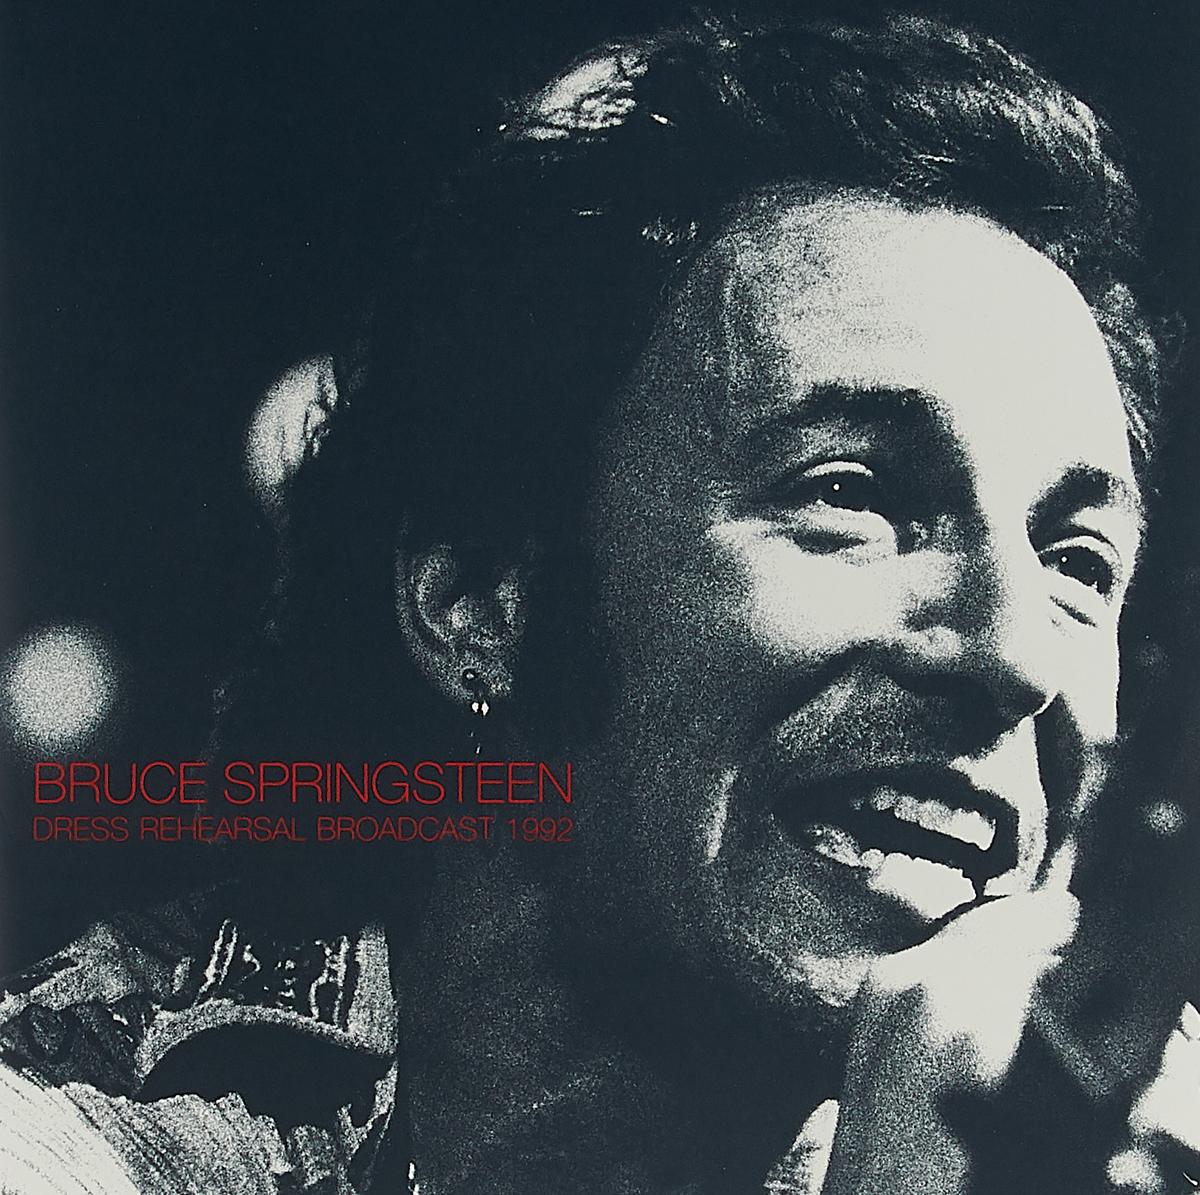 Брюс Спрингстин Bruce Springsteen. Dress Rehearsal Broadcast 1992 (2 LP) брюс спрингстин bruce springsteen passaic night 1978 the classic new jersey broadcast volume two 2 lp